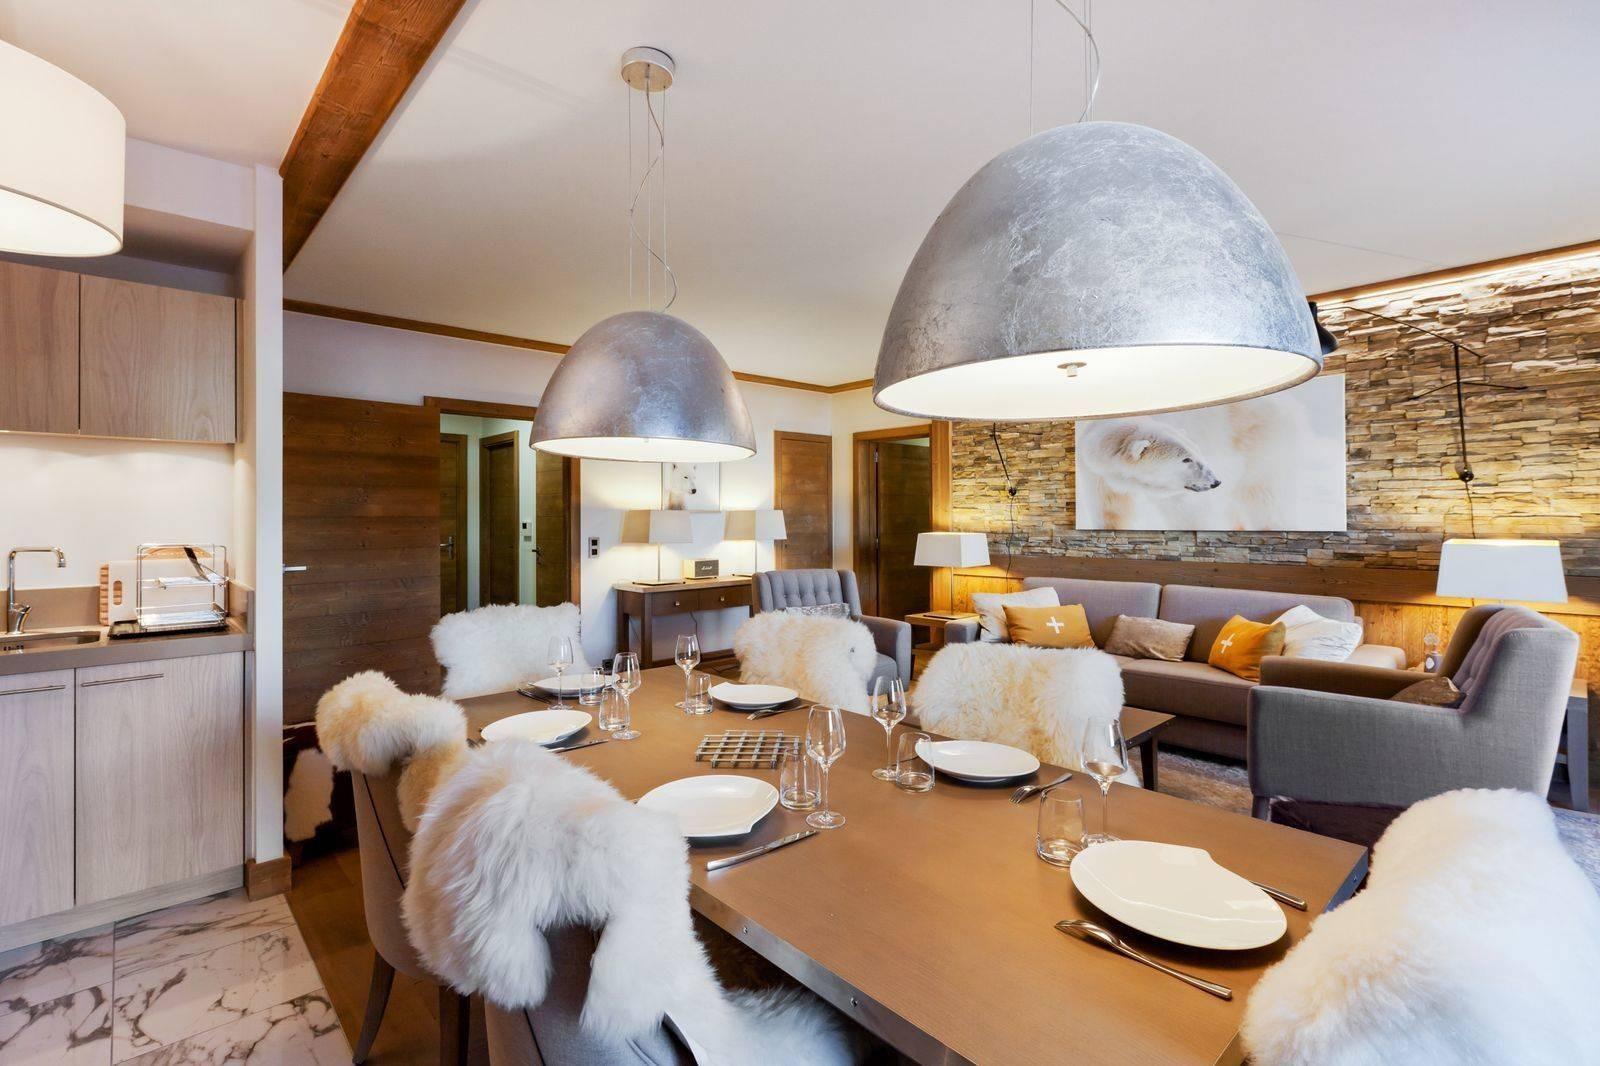 Courchevel 1550 Location Appartement Luxe Telokia Salle A Manger